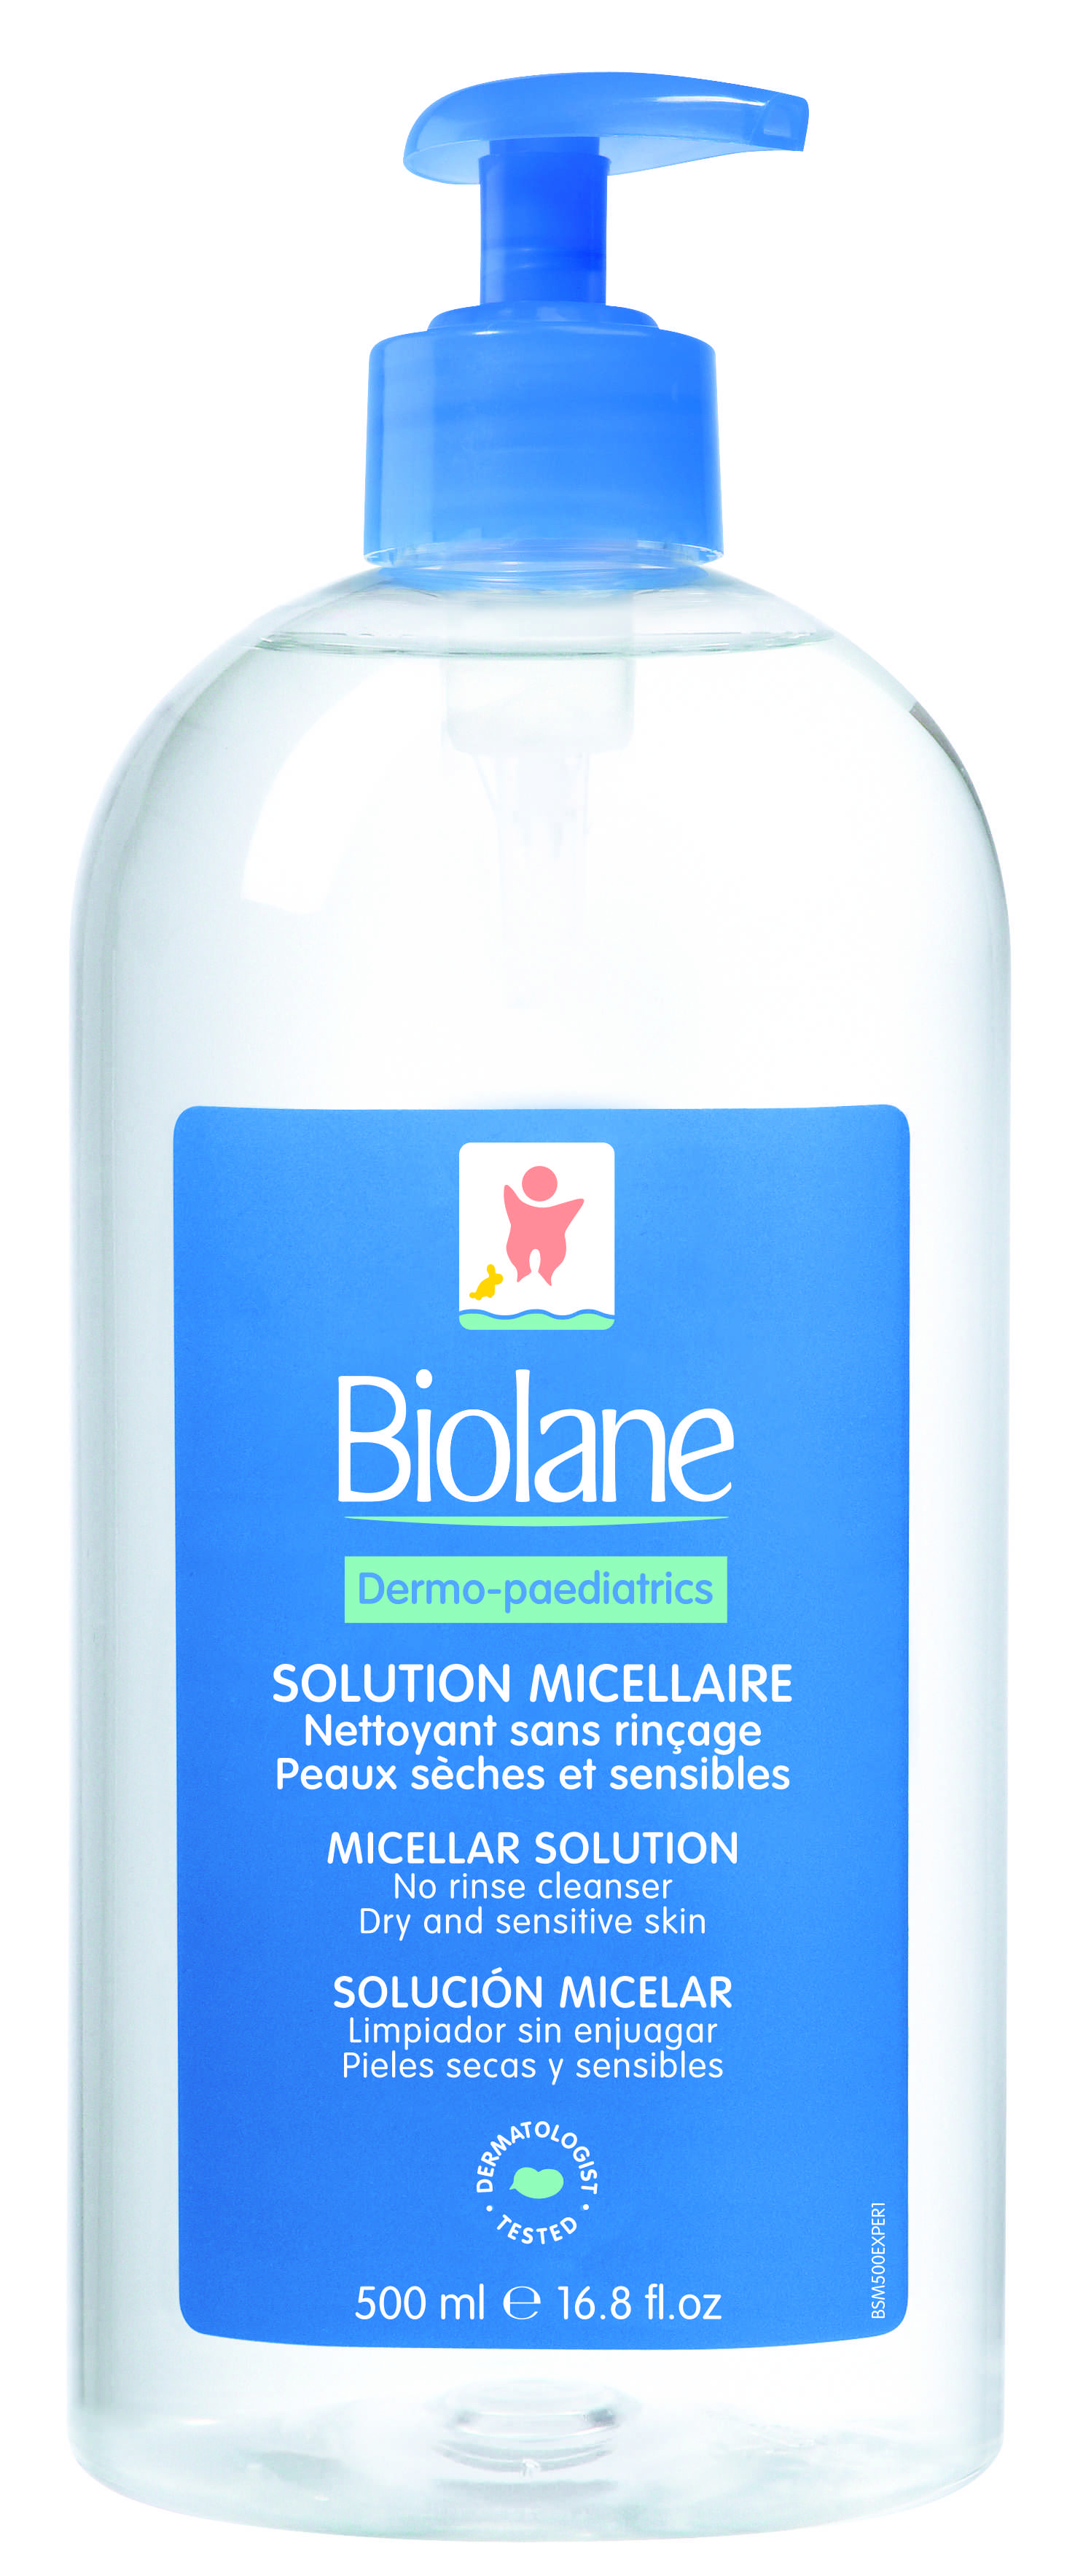 Image Dermo-paediatrics Micellar Water